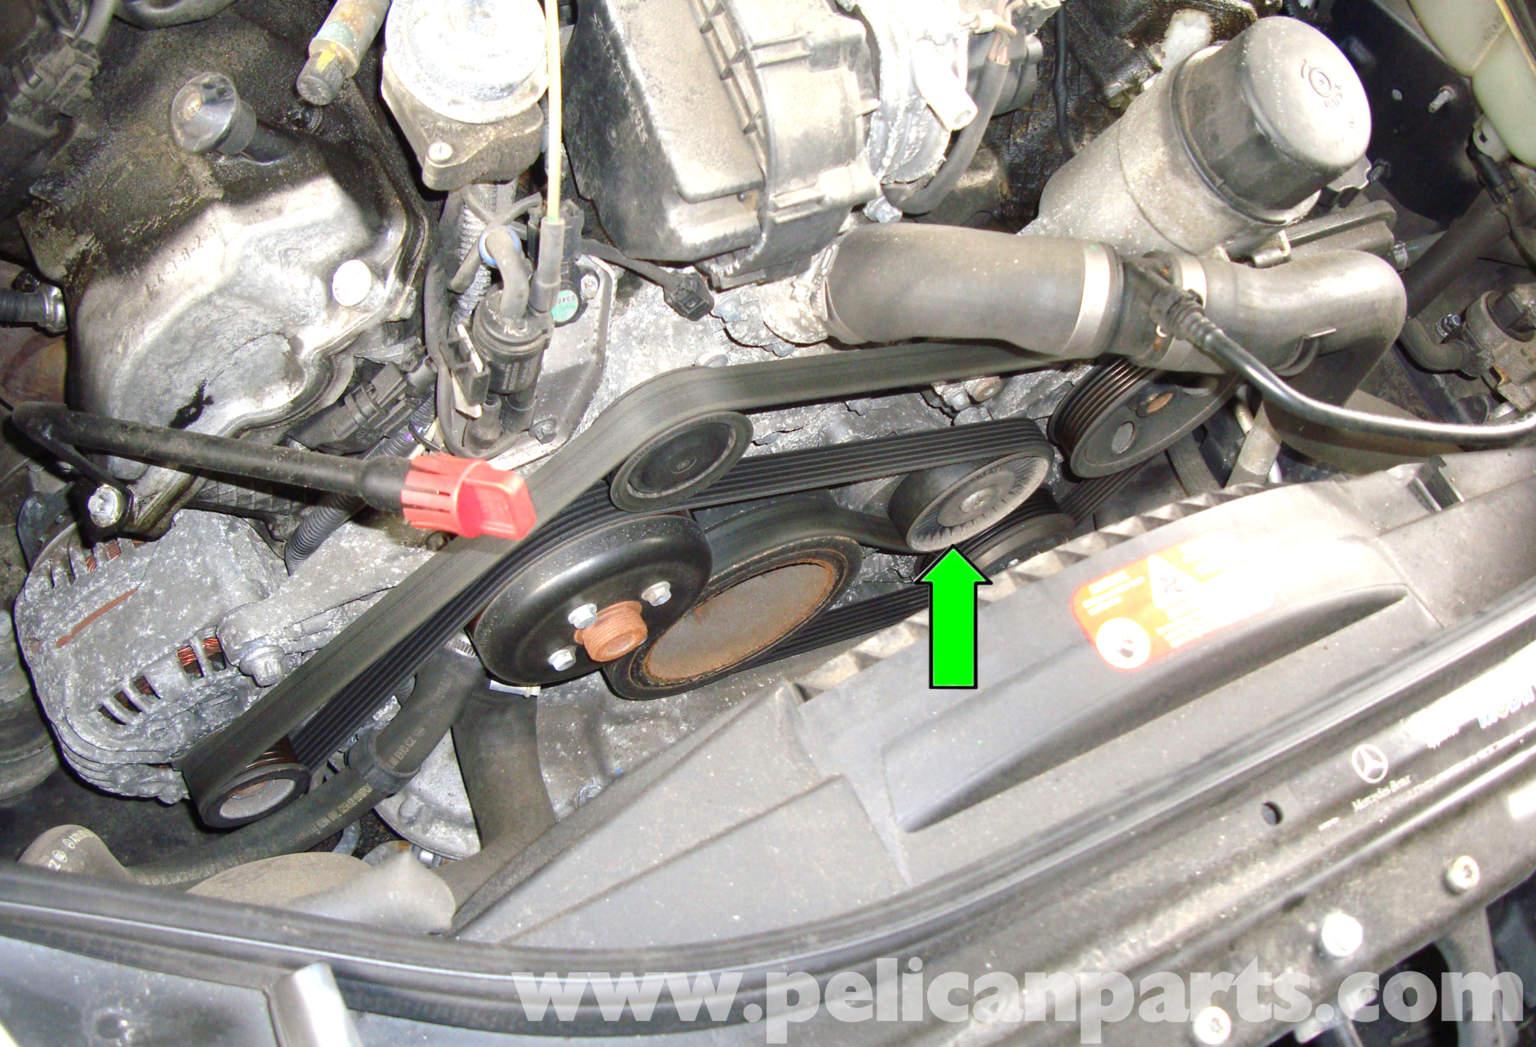 Mercedes benz w211 accessory drive belt replacement 2003 for Replacement parts for mercedes benz